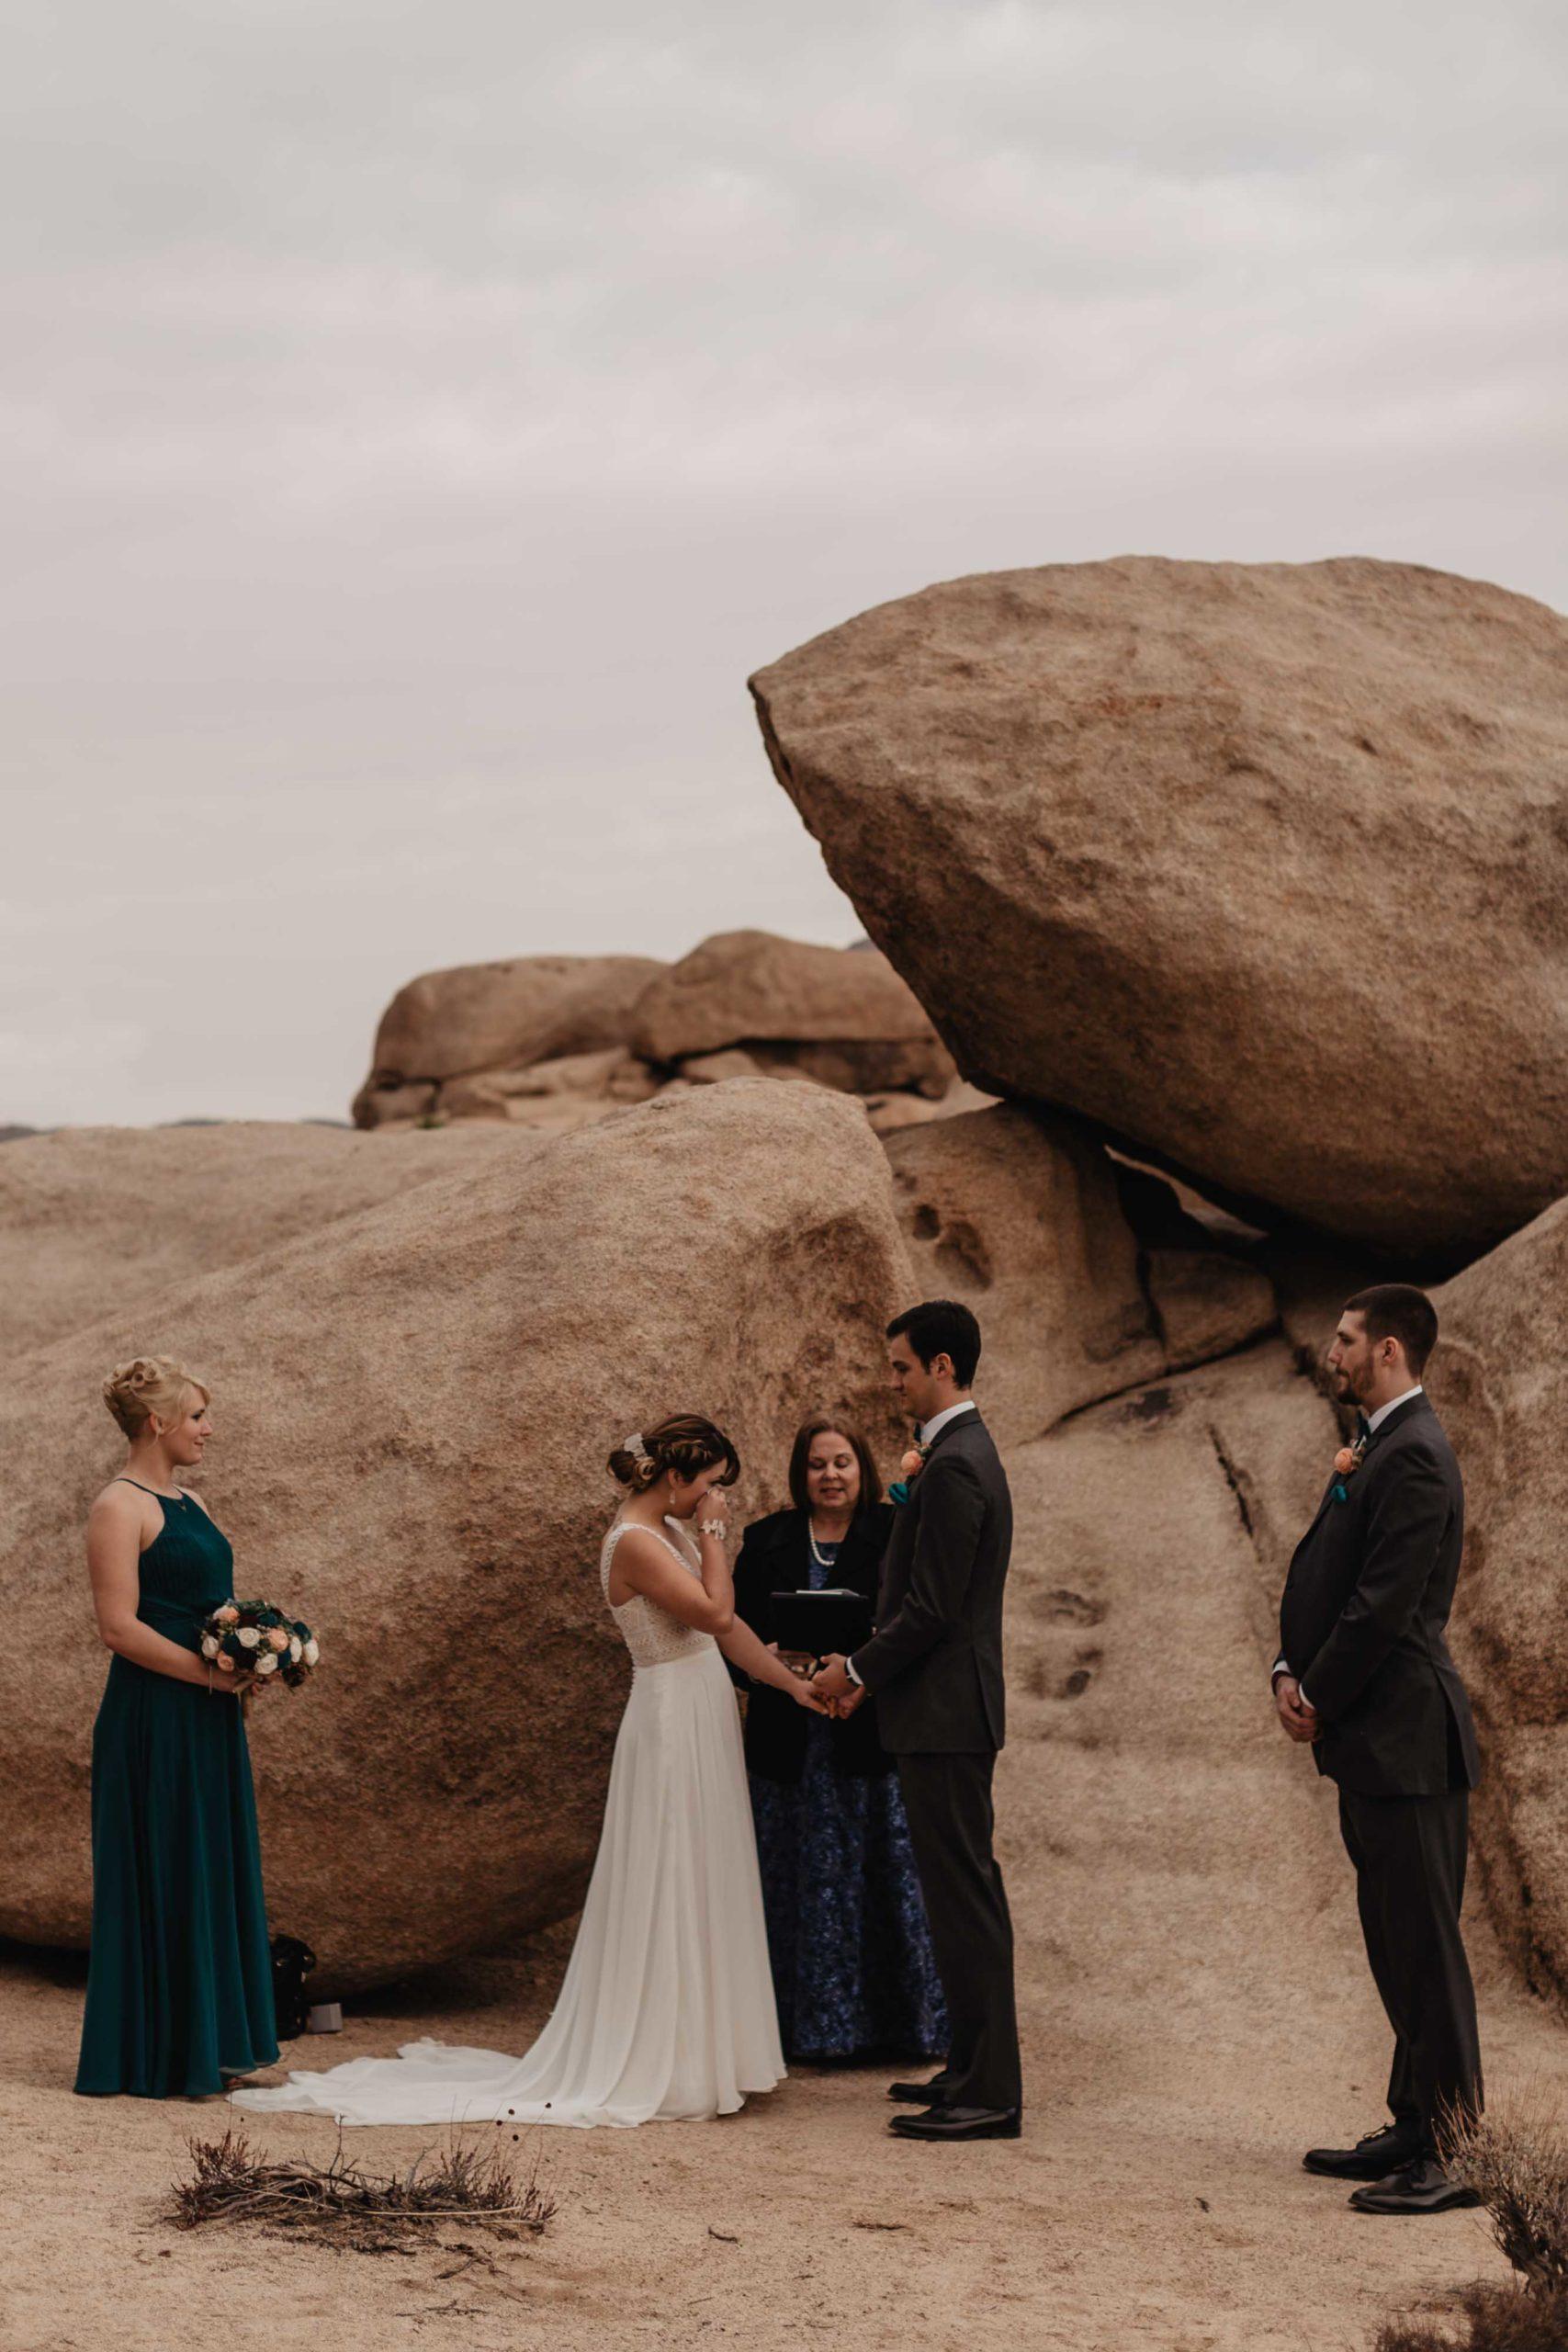 Desert elopement in Joshua Tree National Park captured by adventure wedding photographer Magnolia + Ember.